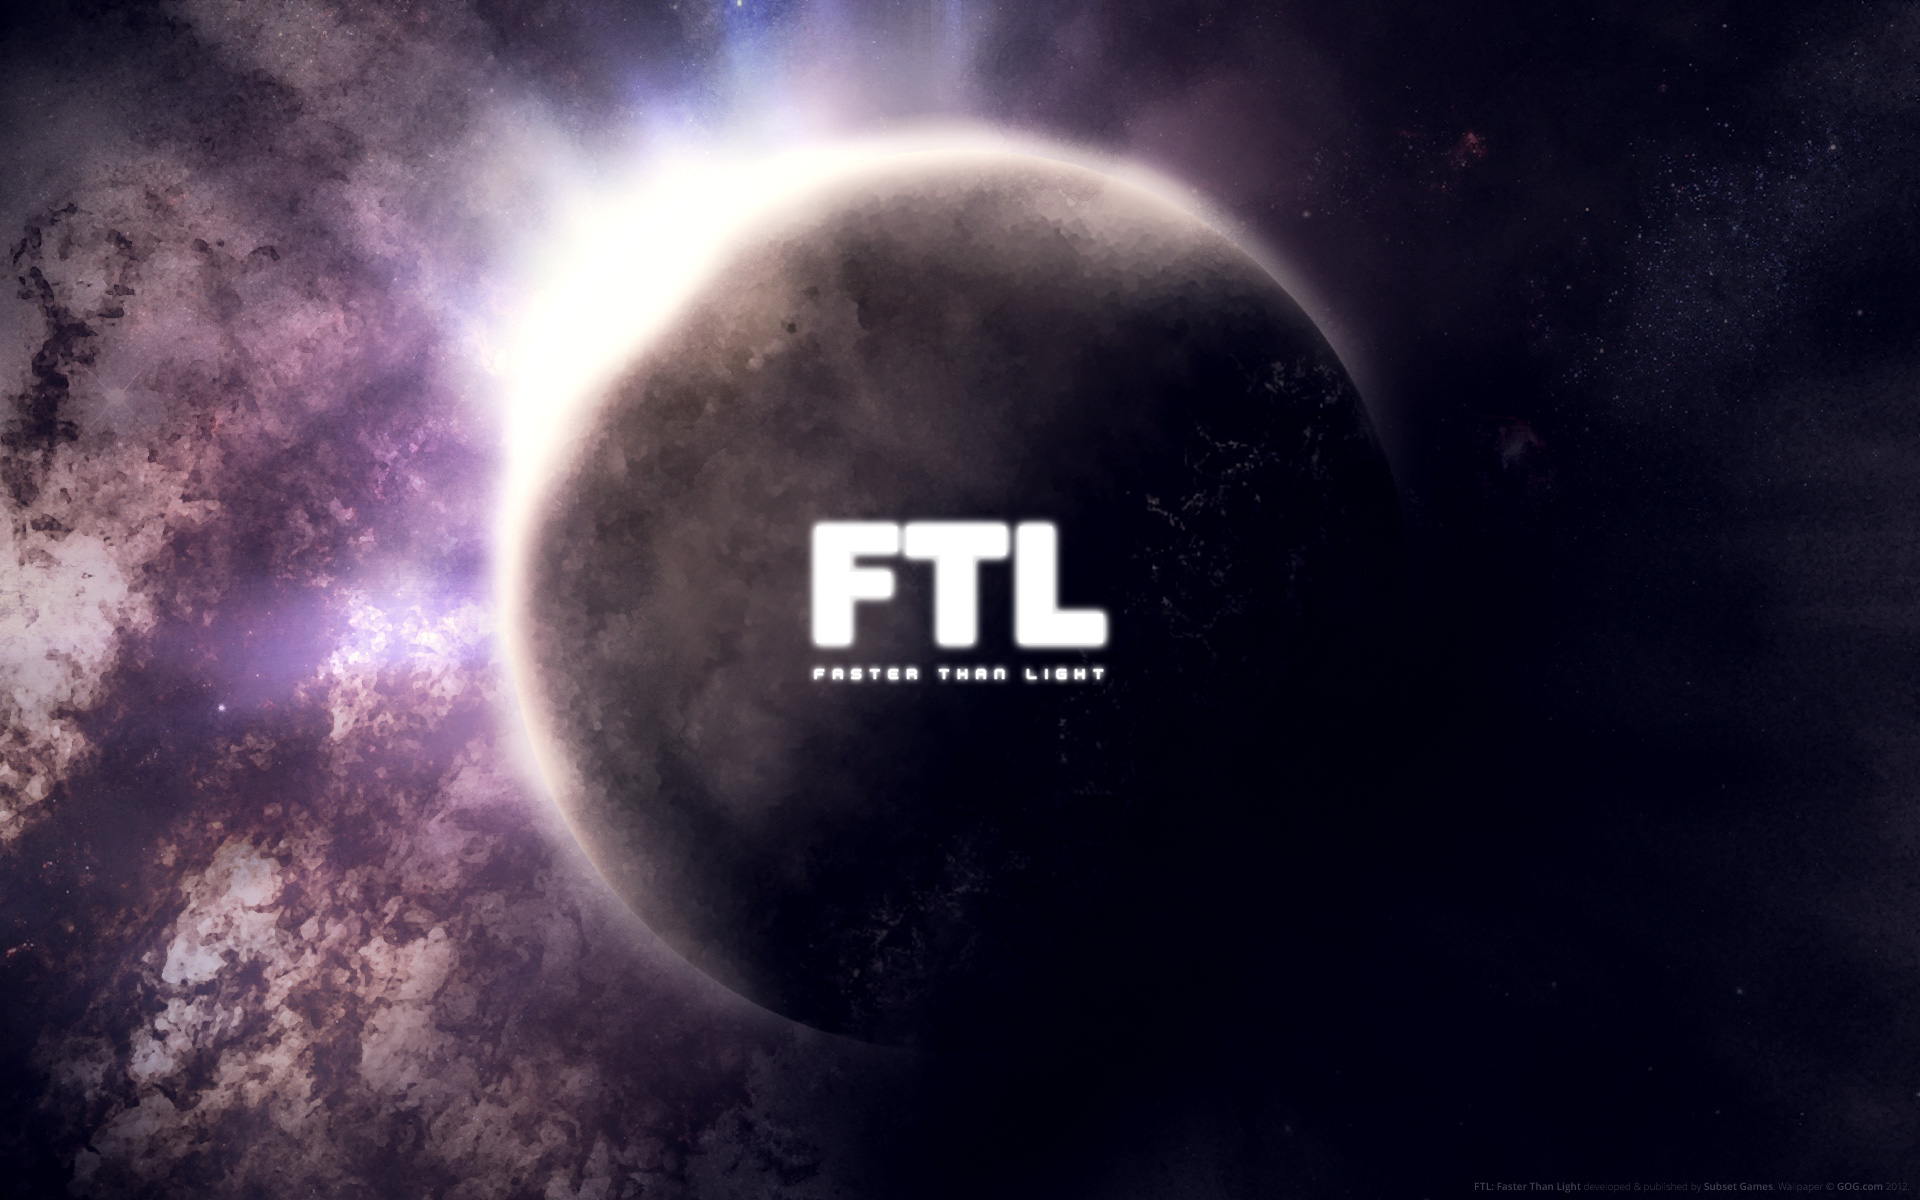 FTL: Faster than Light por fin recibe su traduccion al español